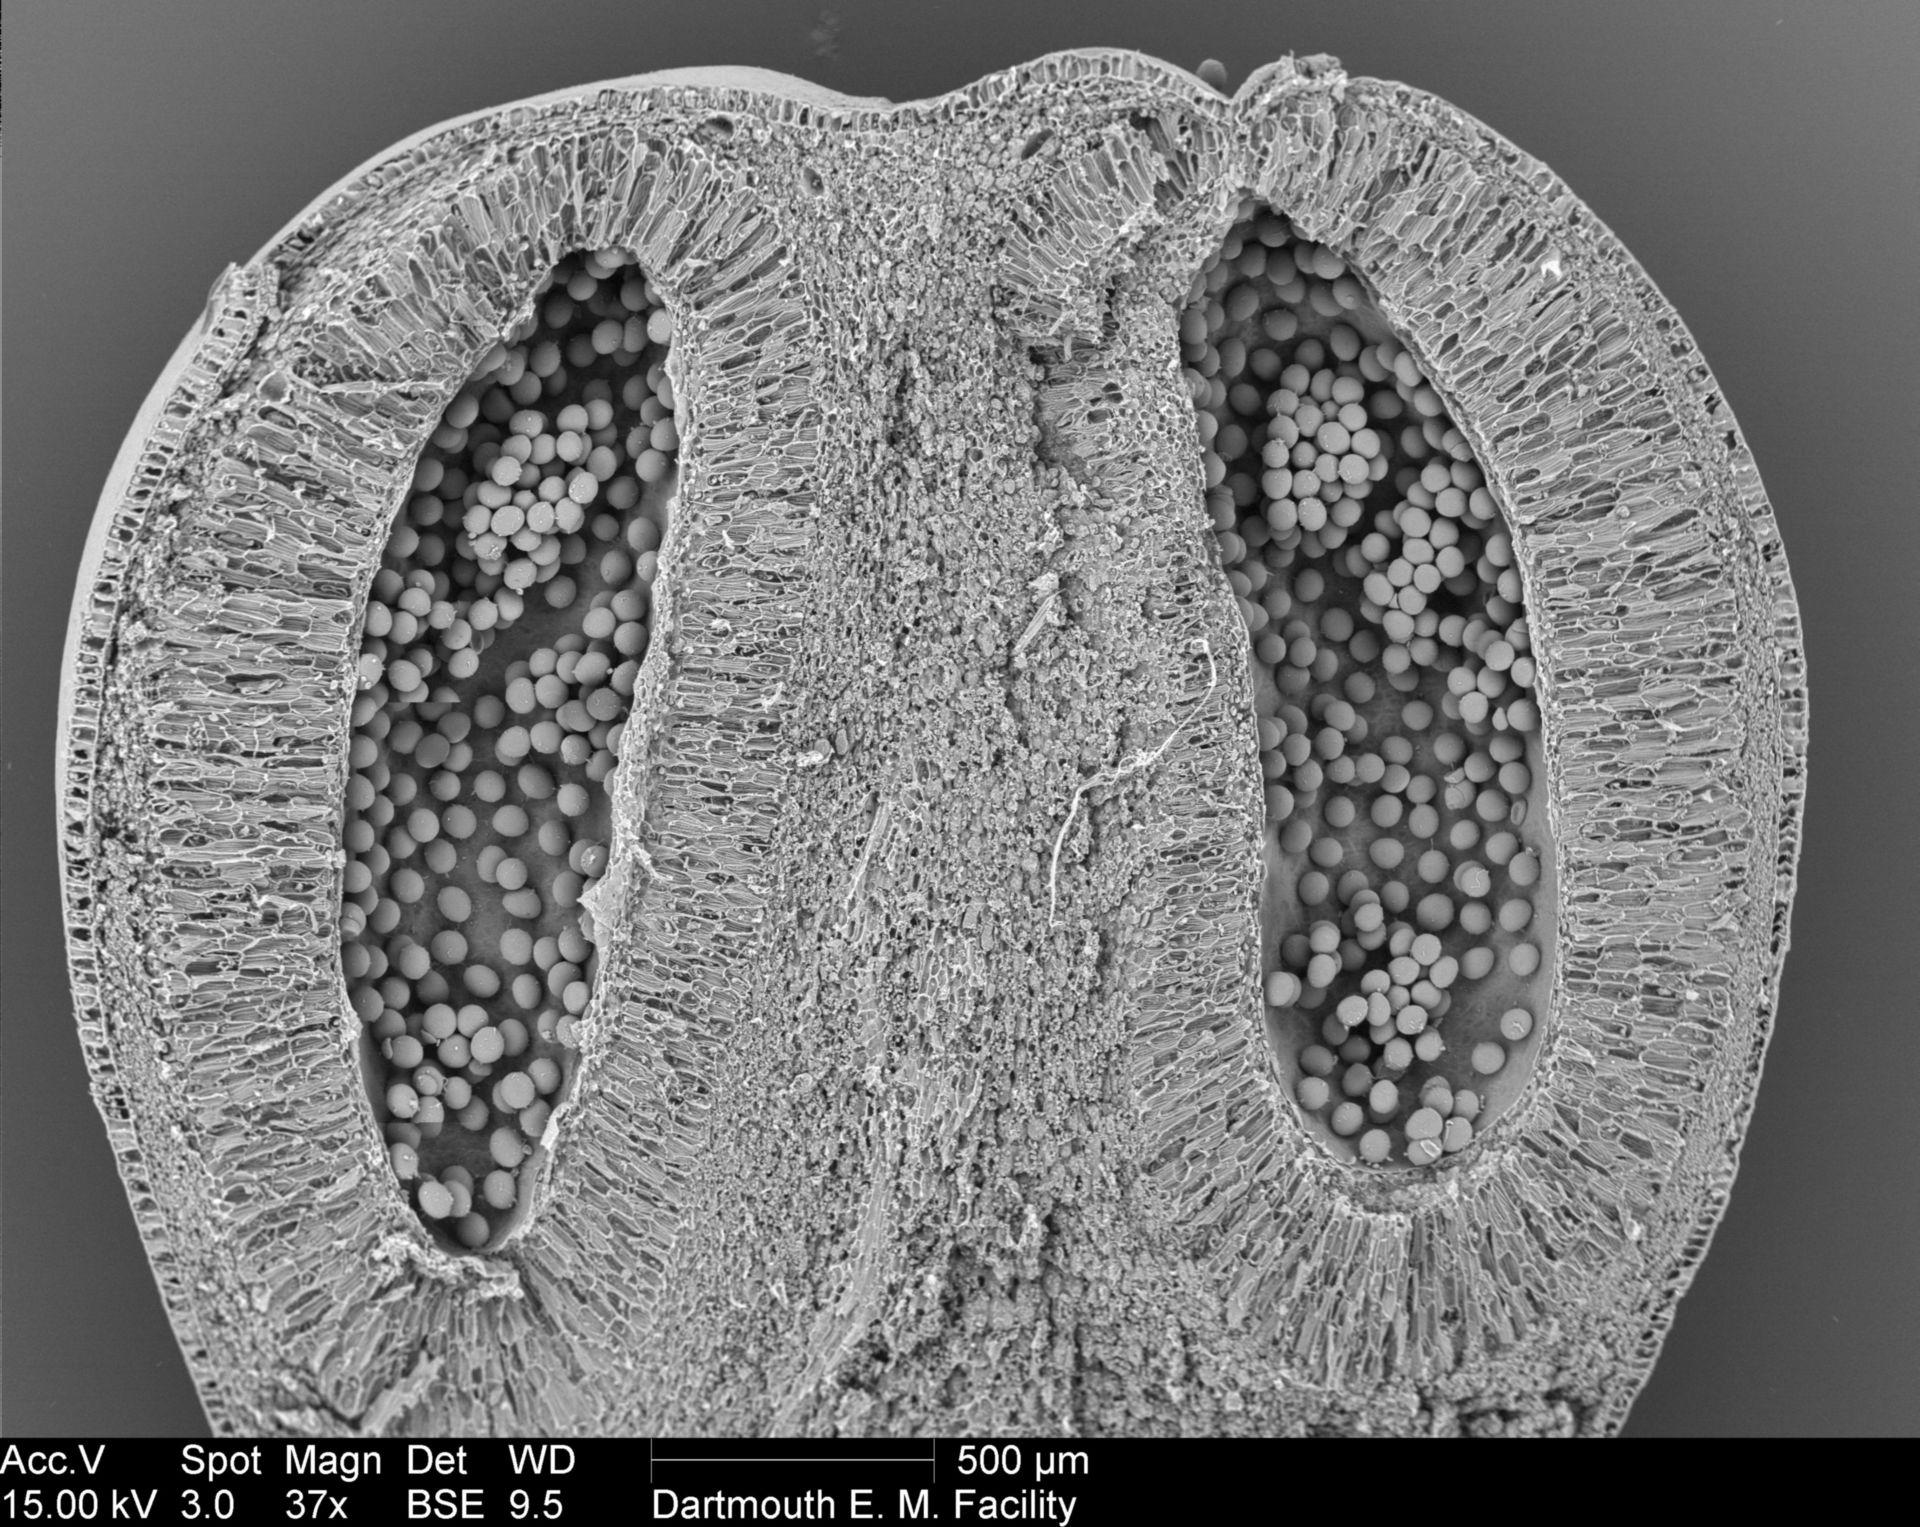 Amorphophallus titanum (Pollen wall) - CIL:39377